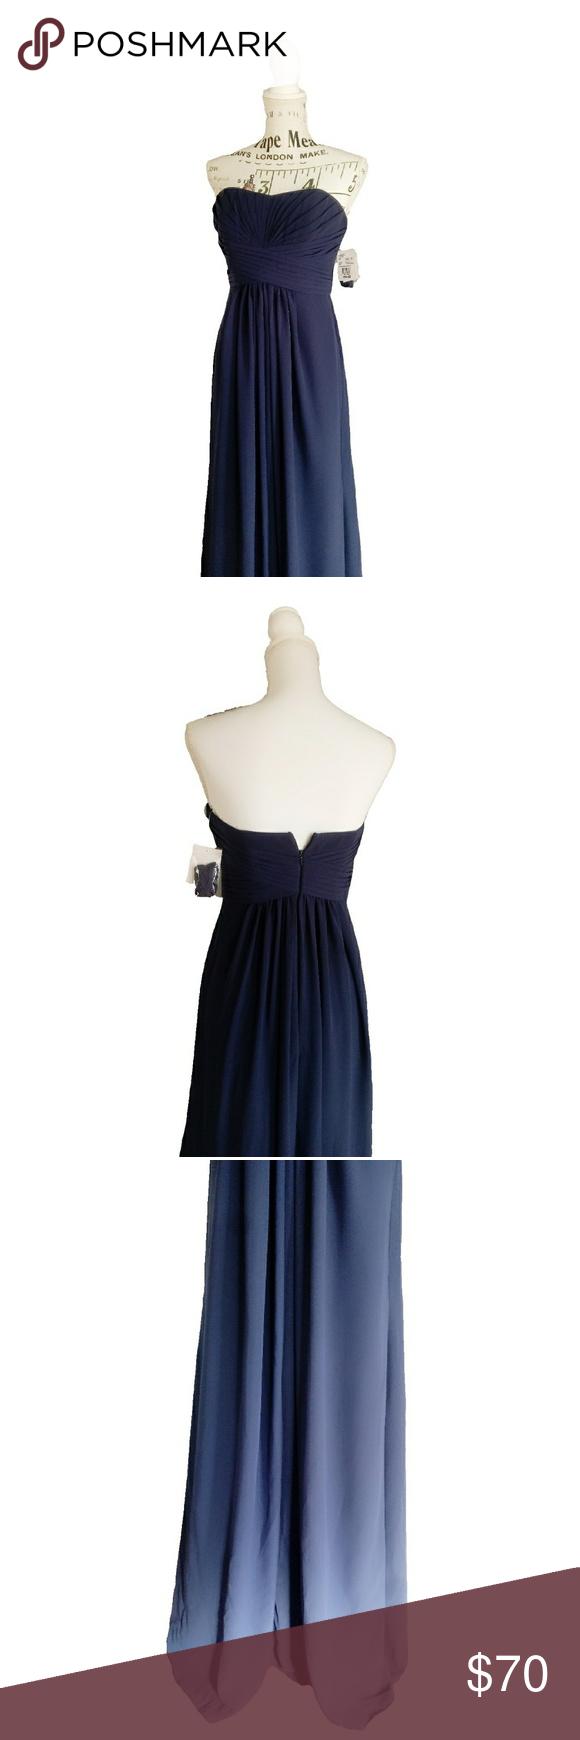 Sold boutique my posh picks pinterest blue formal dresses